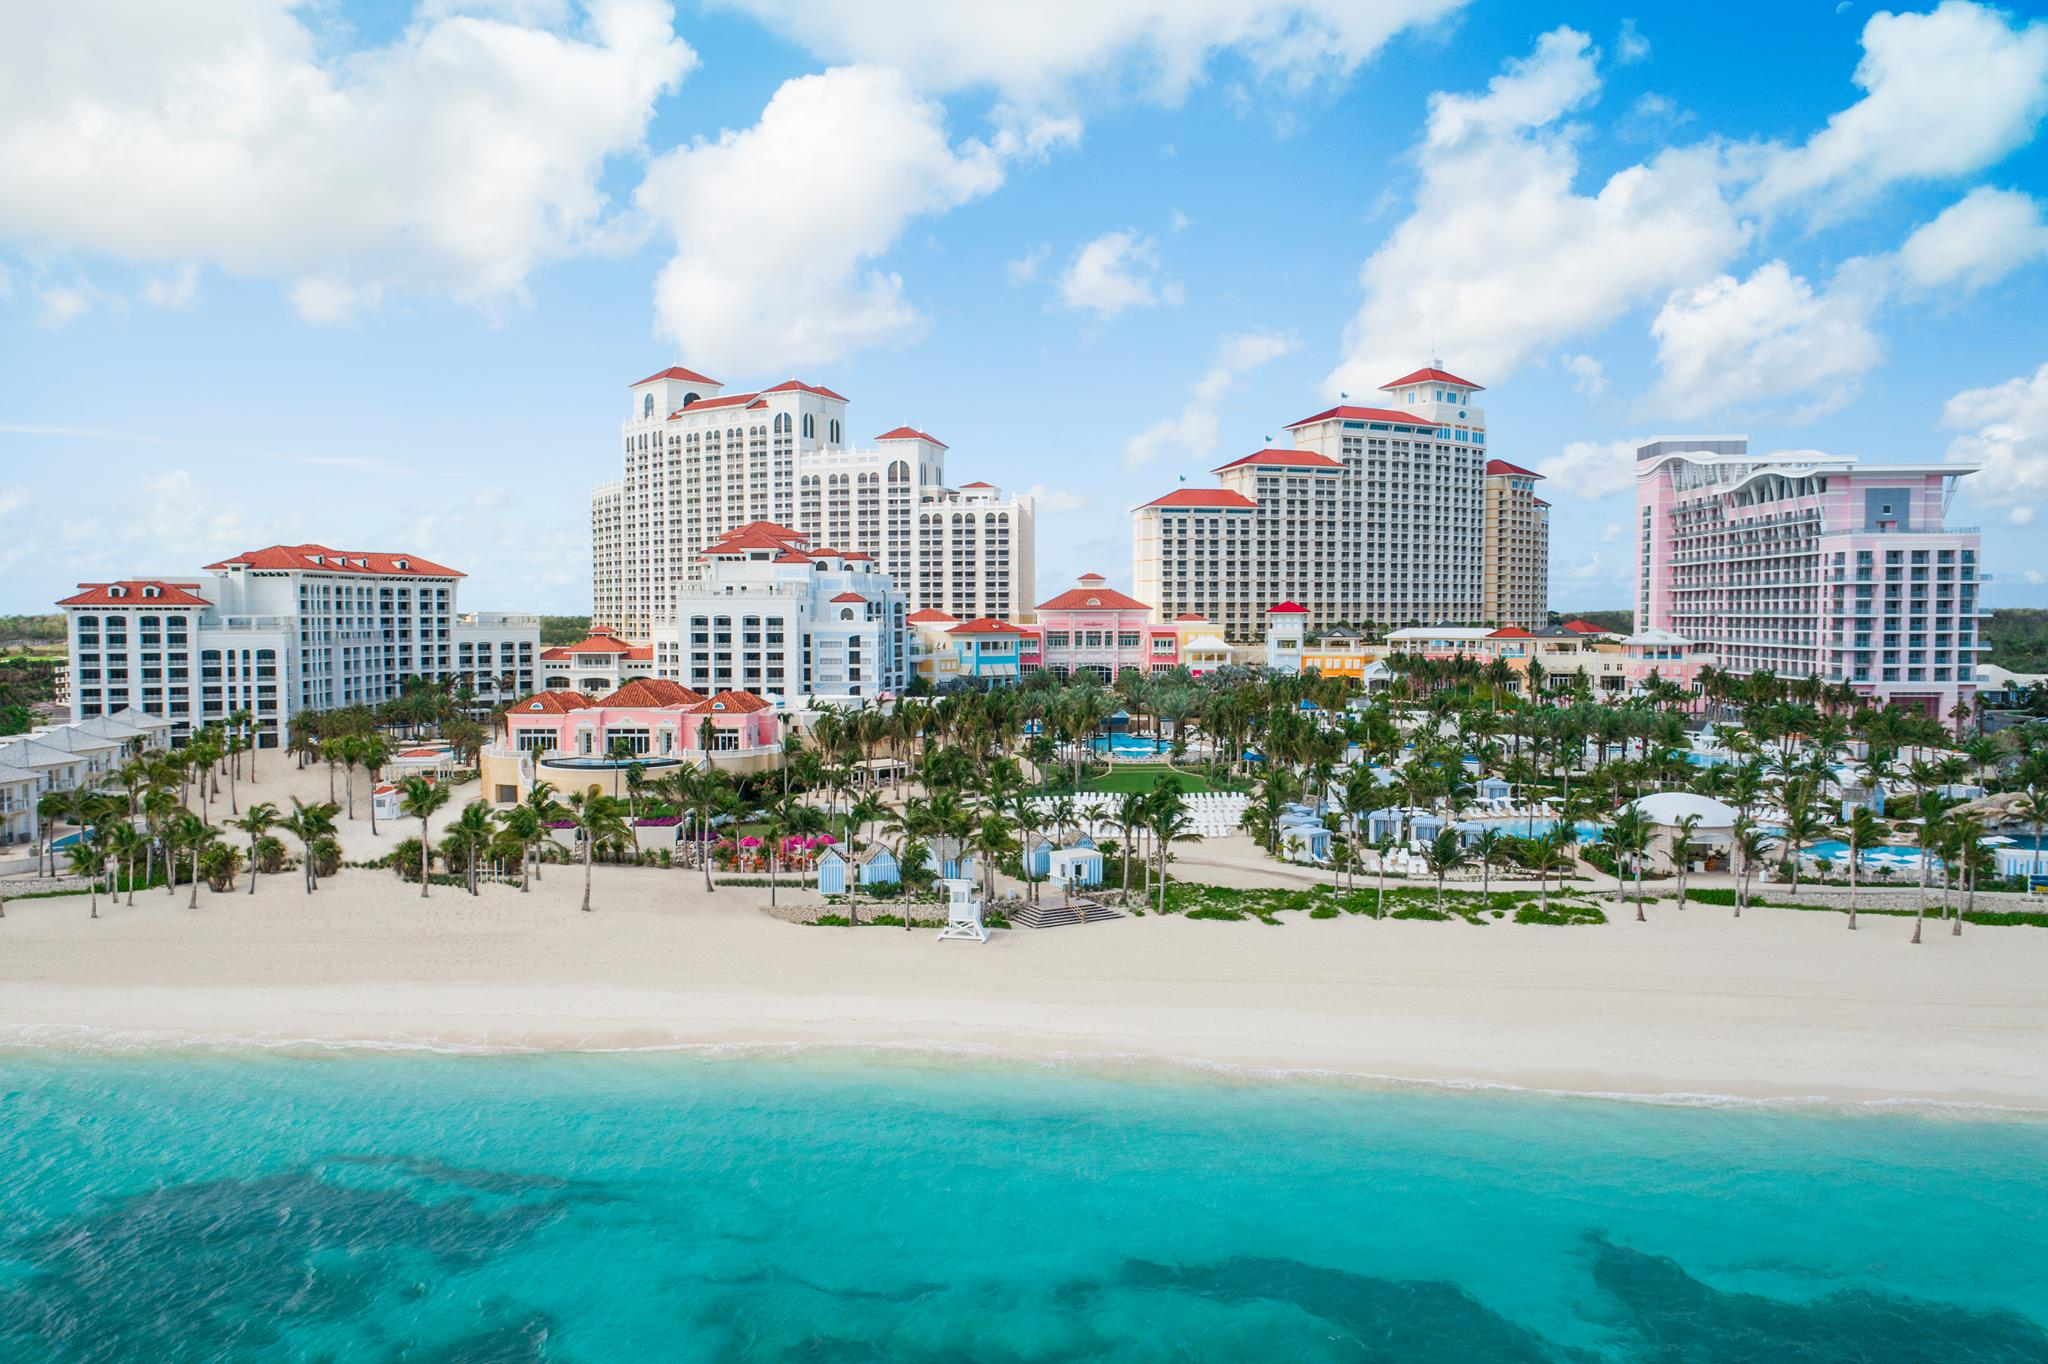 Sandals royal bahamian resort vs grand hyatt baha mar